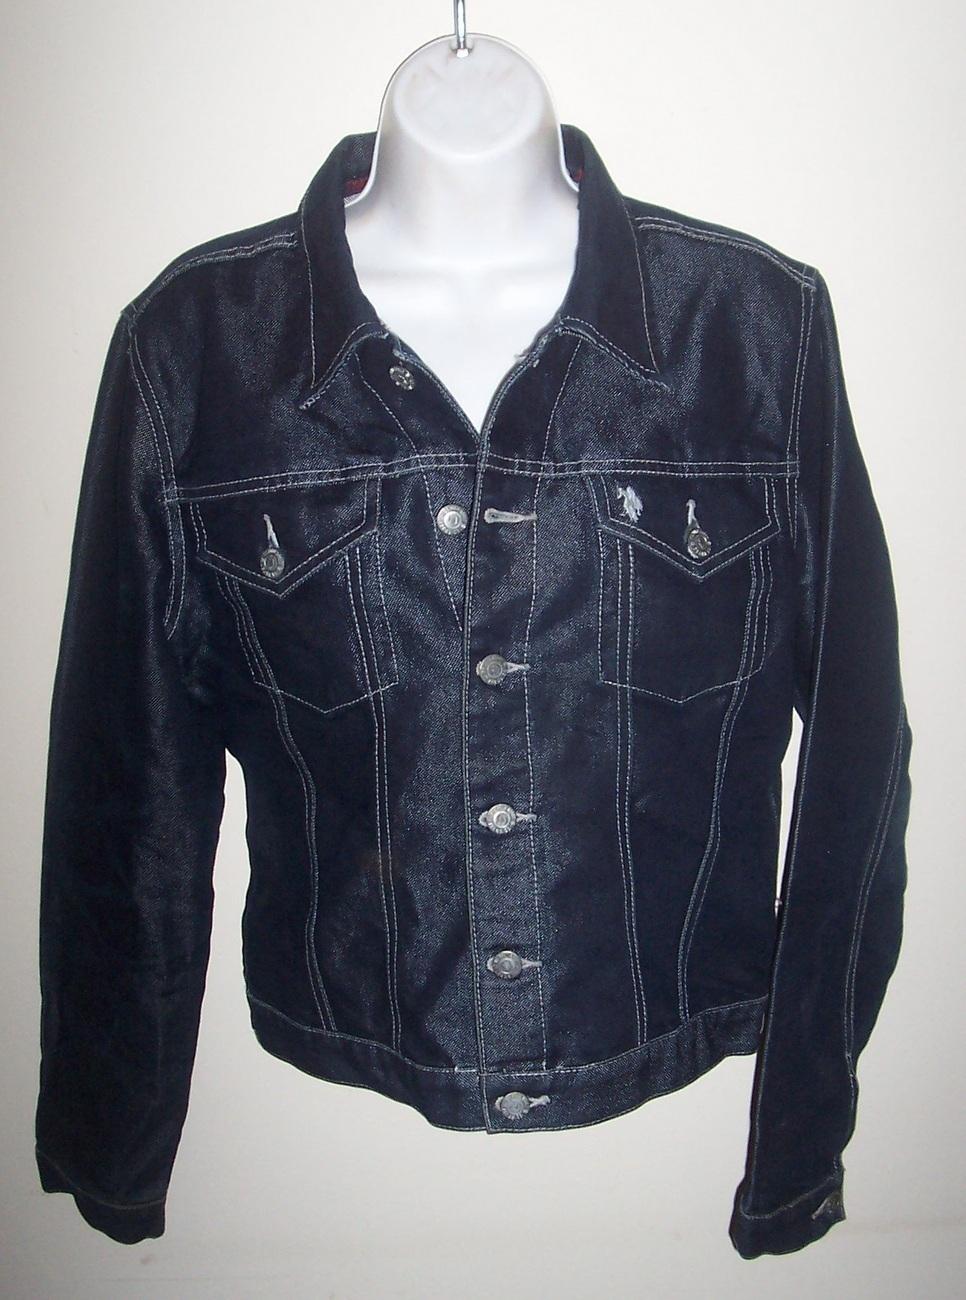 U.S. Polo Dark Blue Denim Jacket Ladies Large image 2